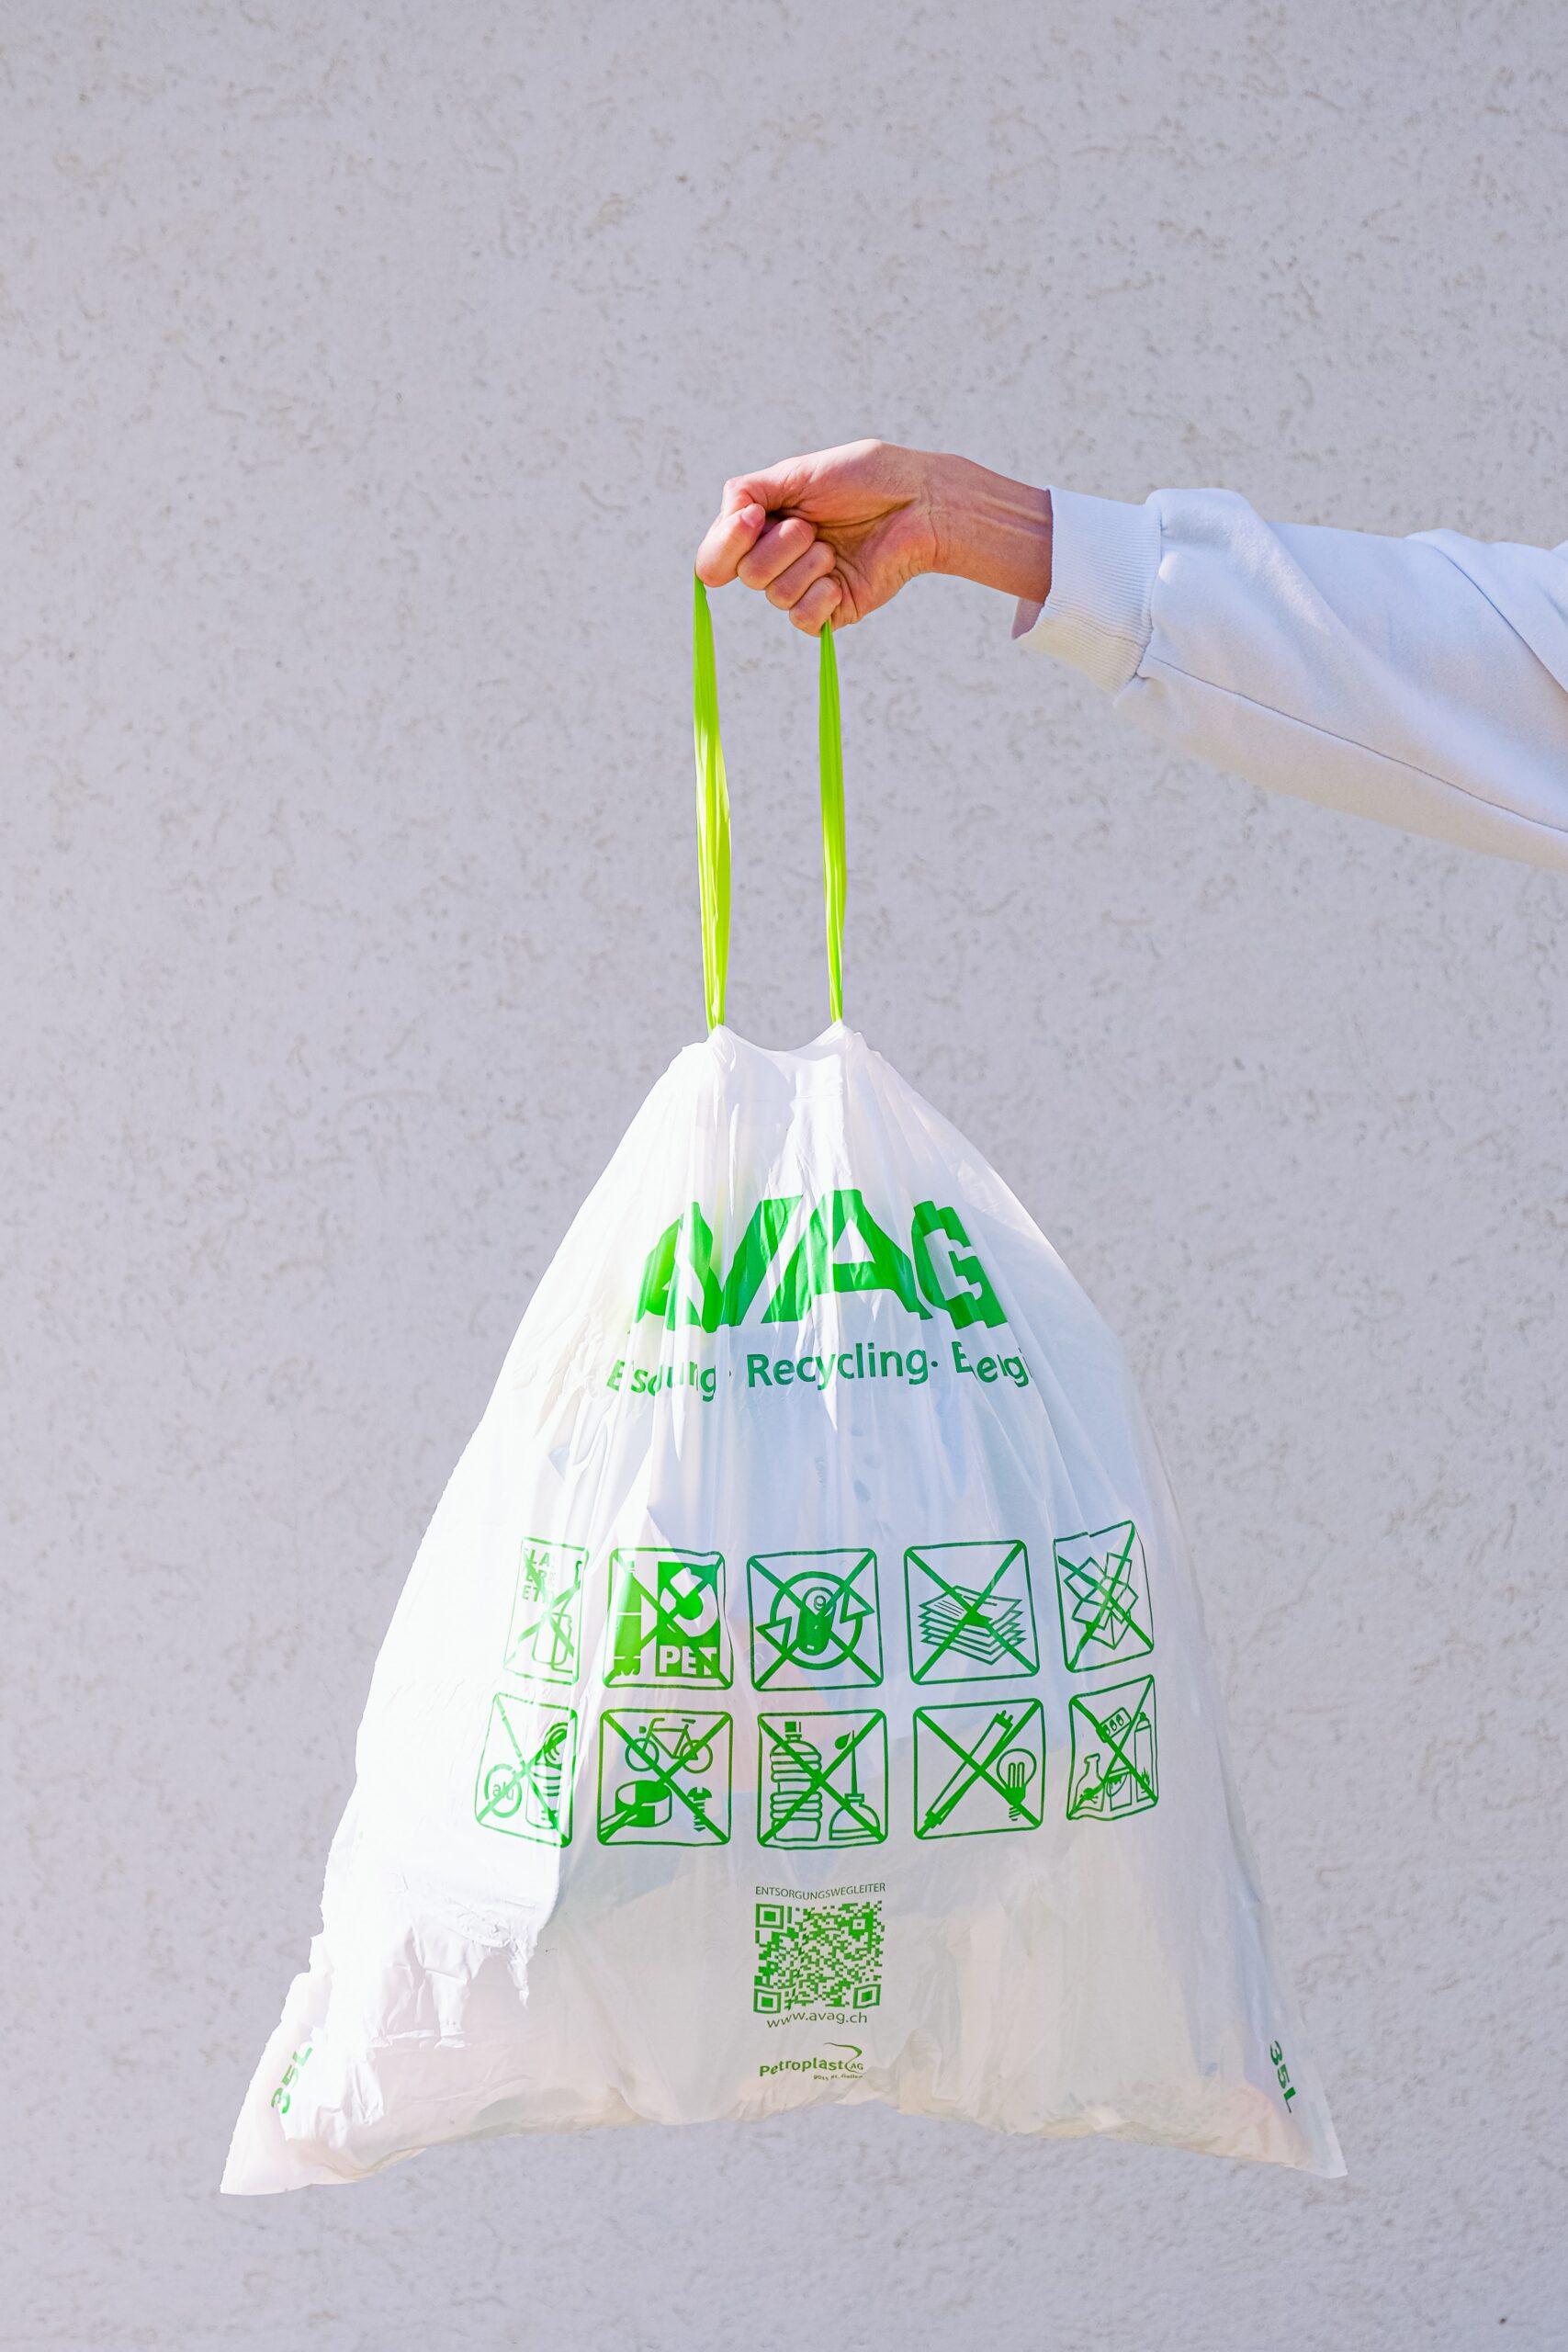 cagplast-manisa-plastik-uretimi-cop-torbasi